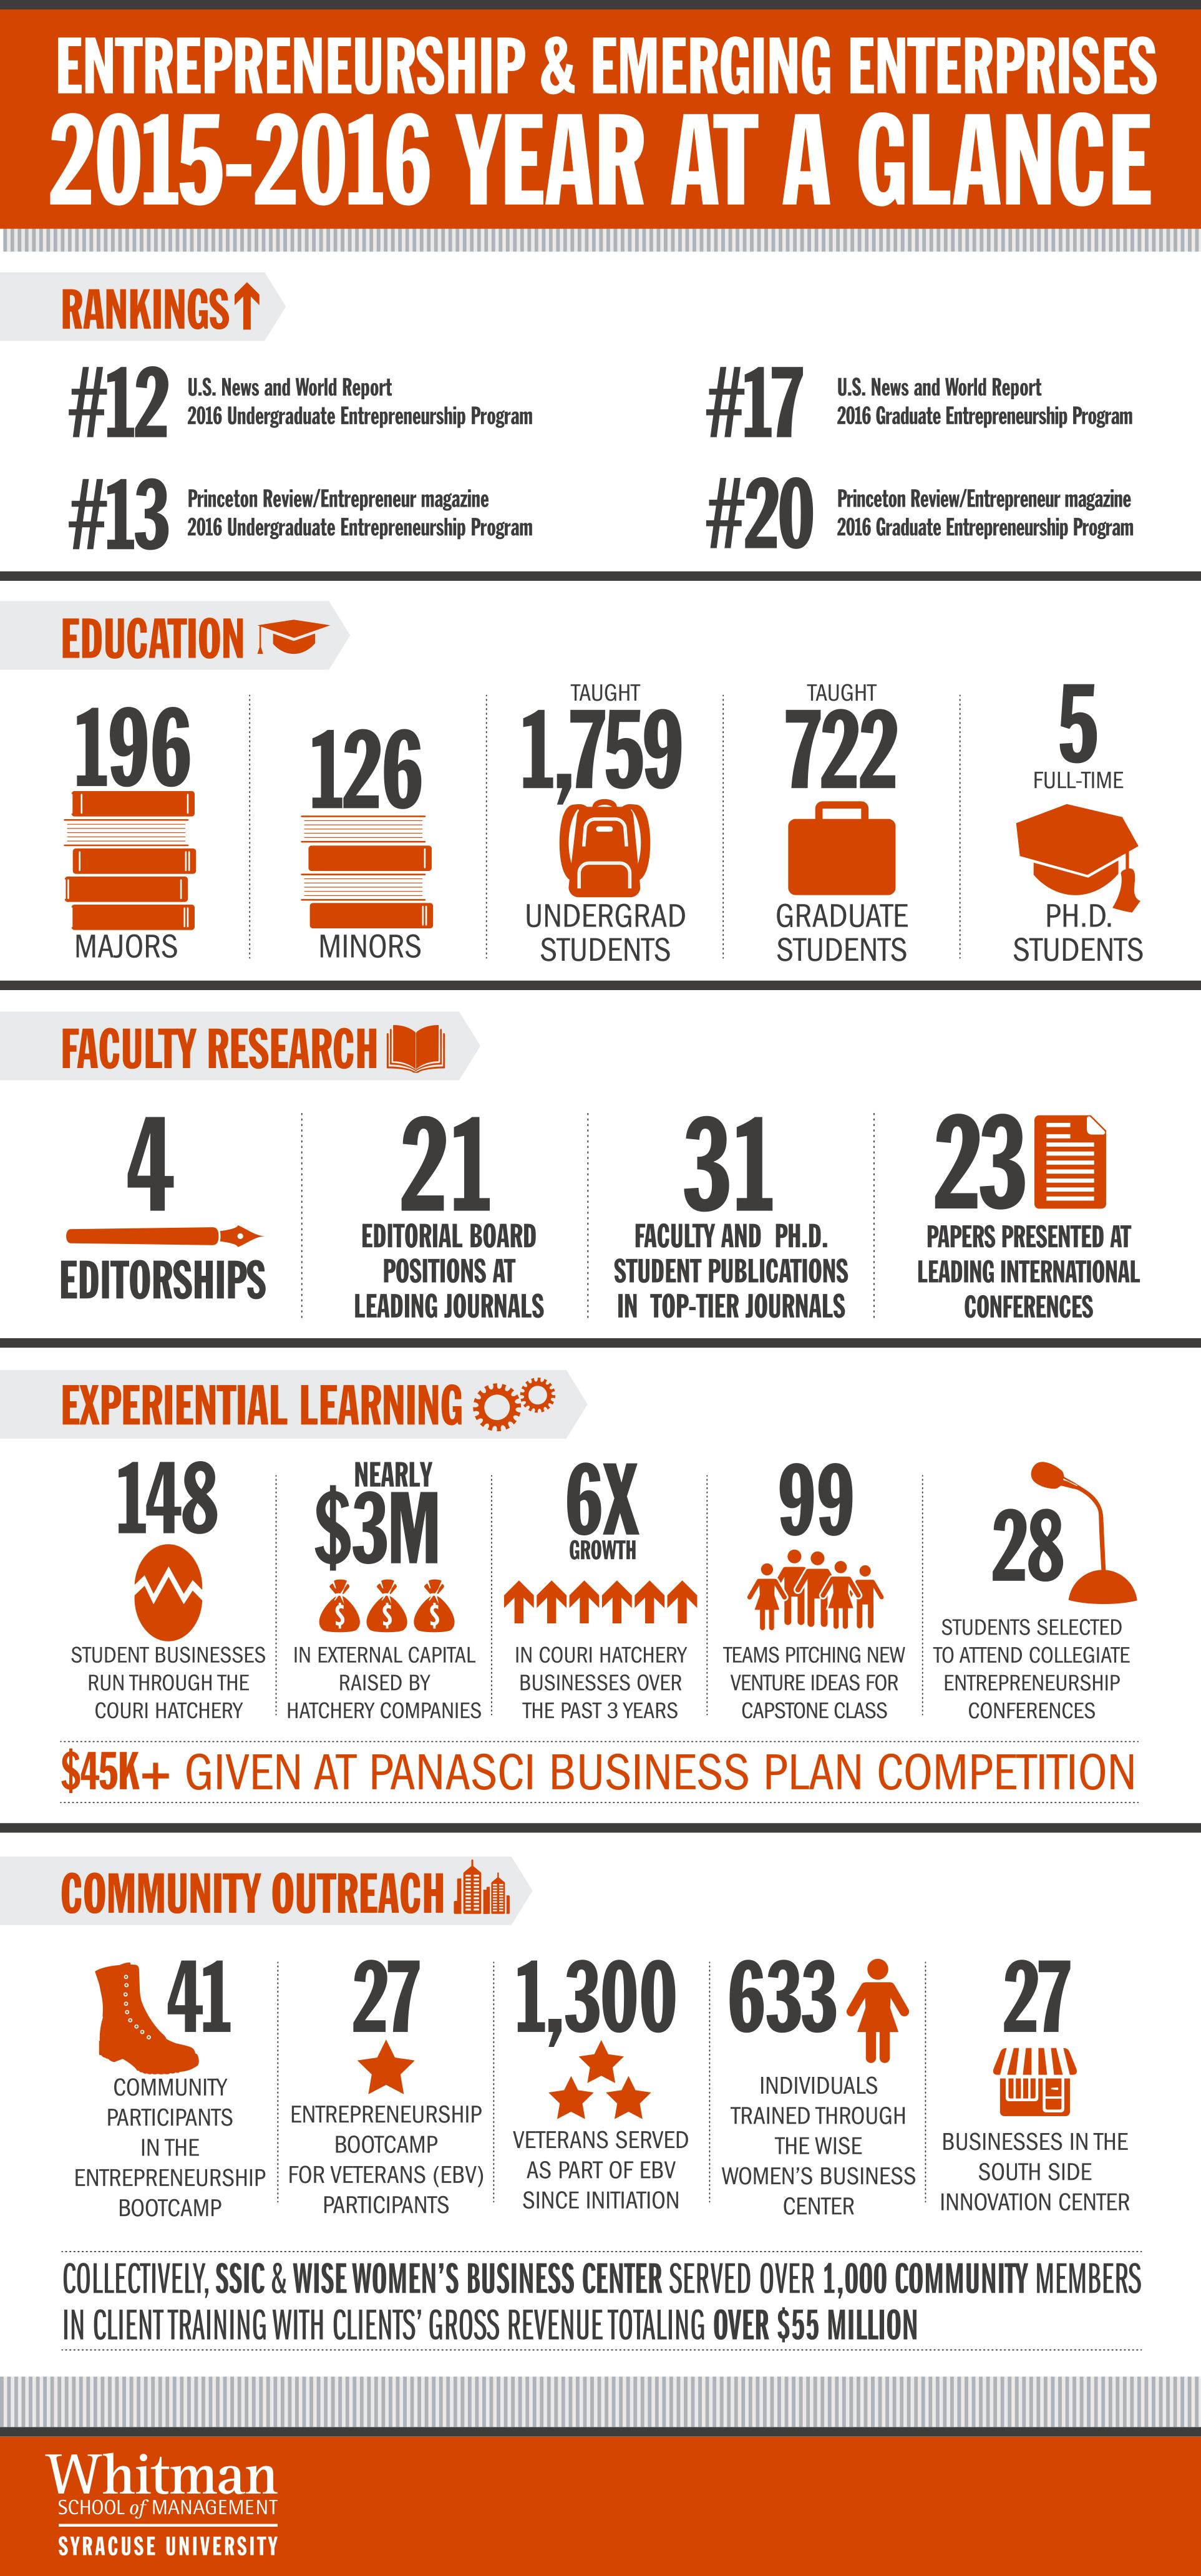 EEE_infographic2015-2016